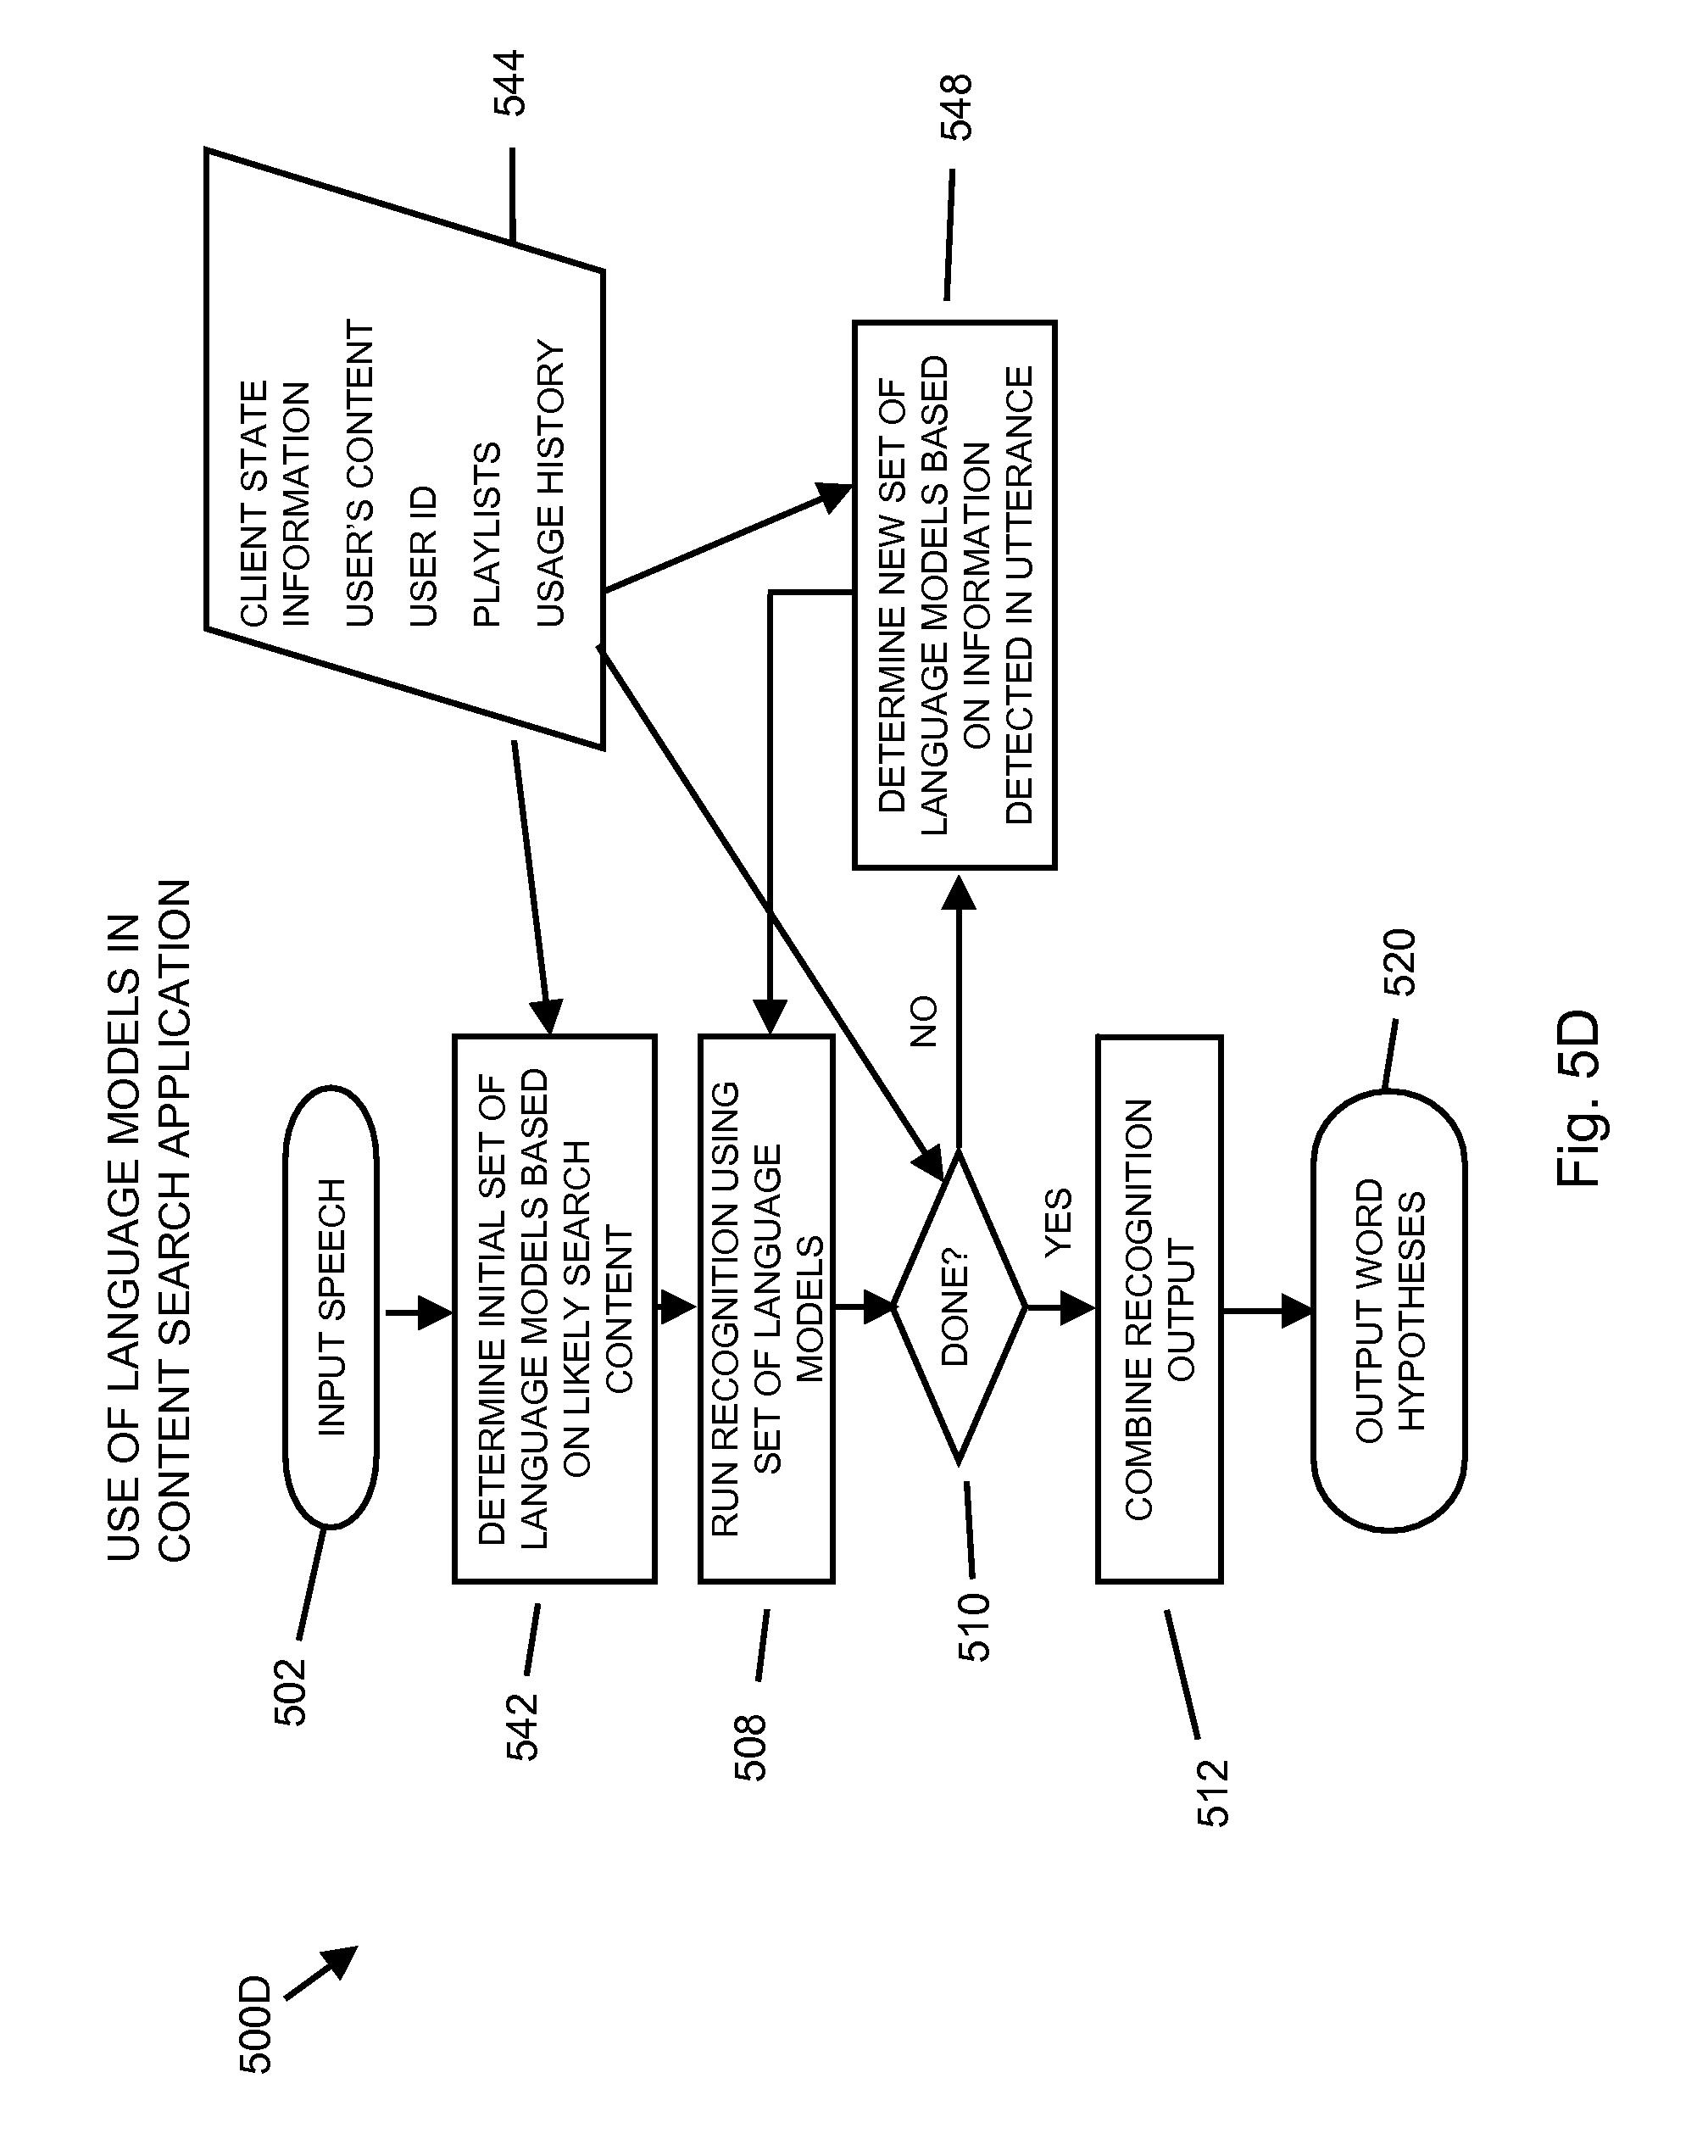 US8838457B2 14 patent us 8,838,457 b2